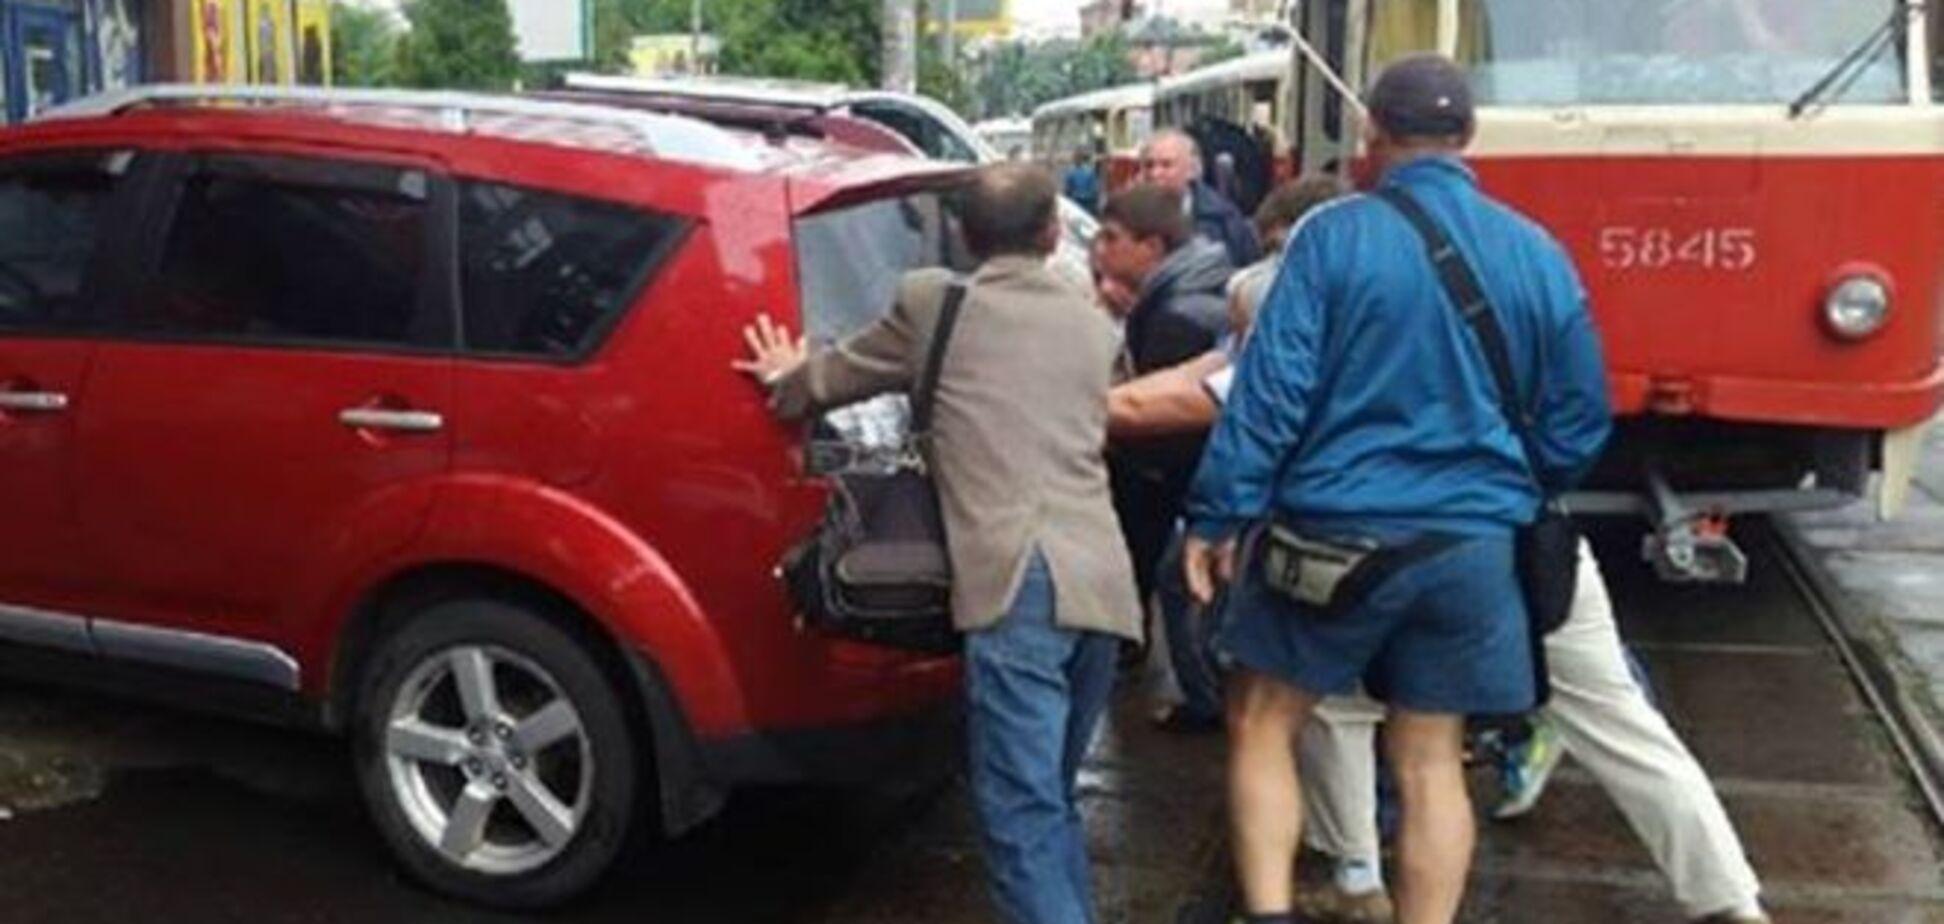 Нахабна 'героїня парковки' зупинила в Києві 5 трамваїв